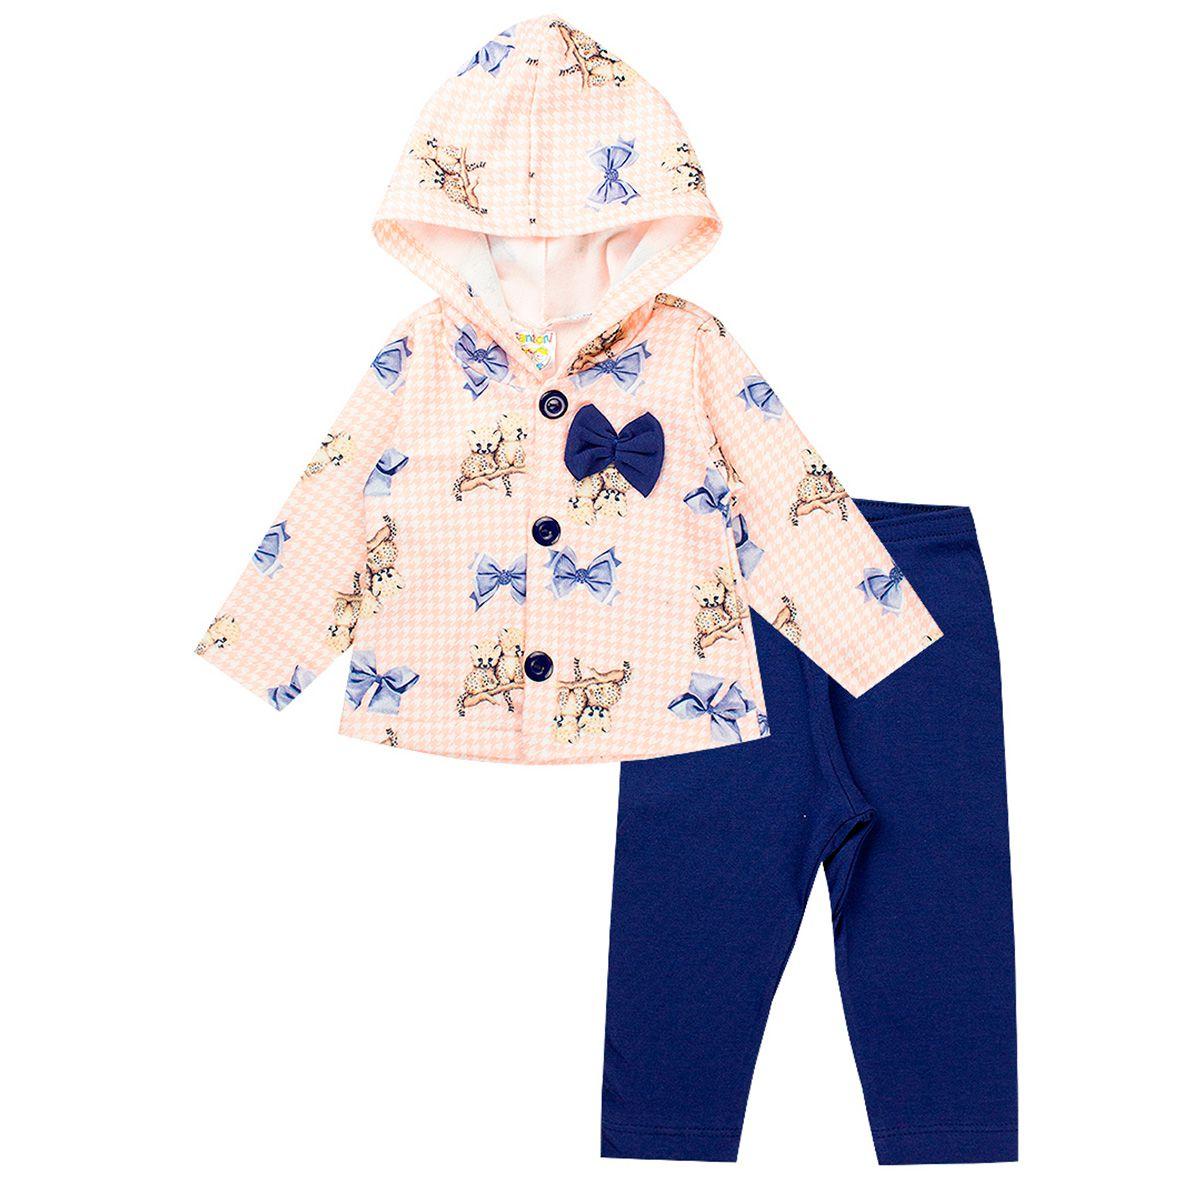 Conjunto Infantil Menina Soft Com Capuz Estampado - Fantoni